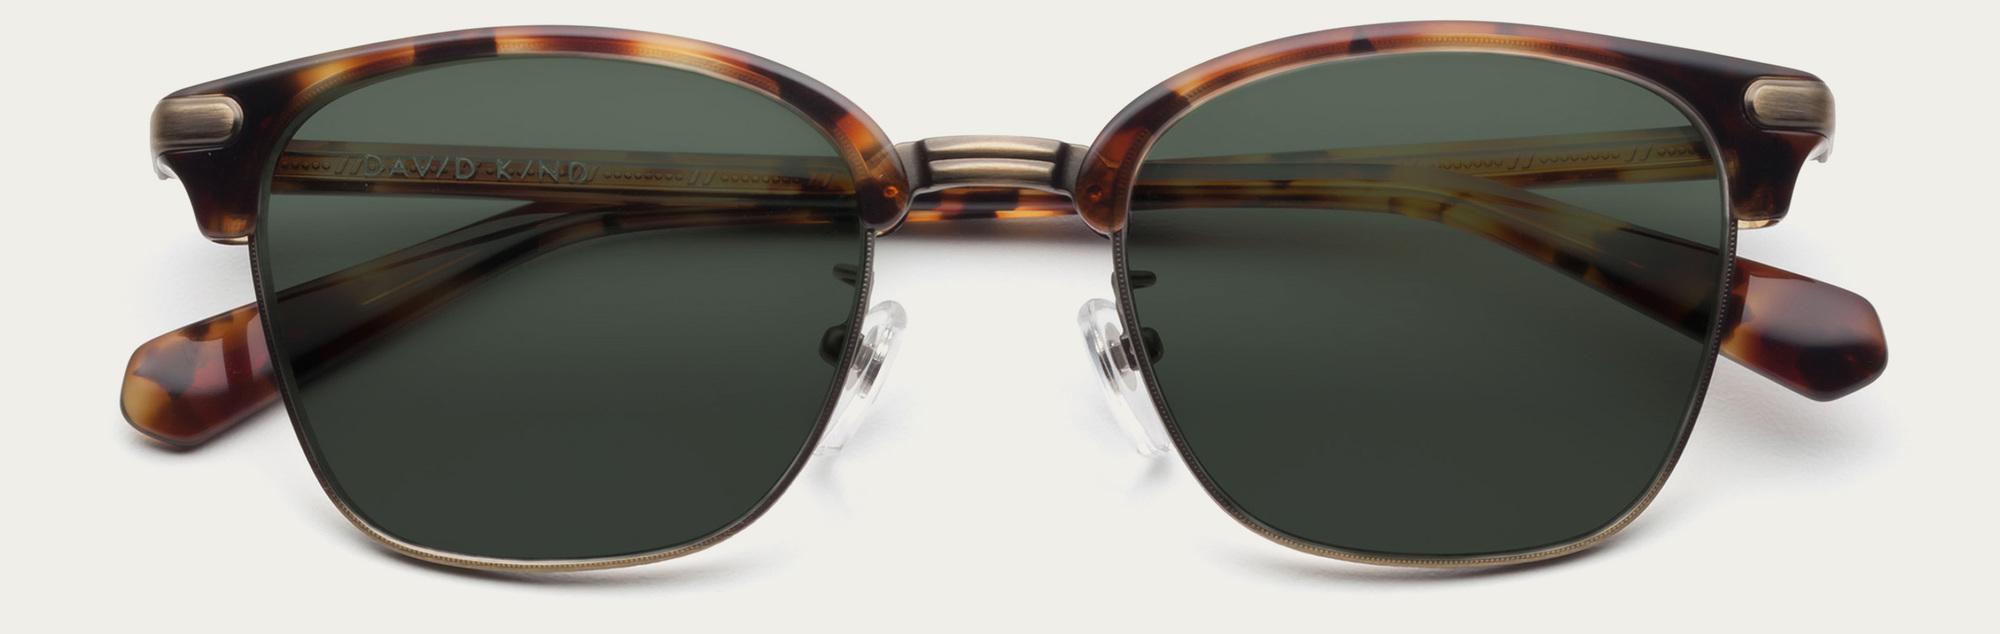 Large 2x katana in aberdeen sun g 15 lens